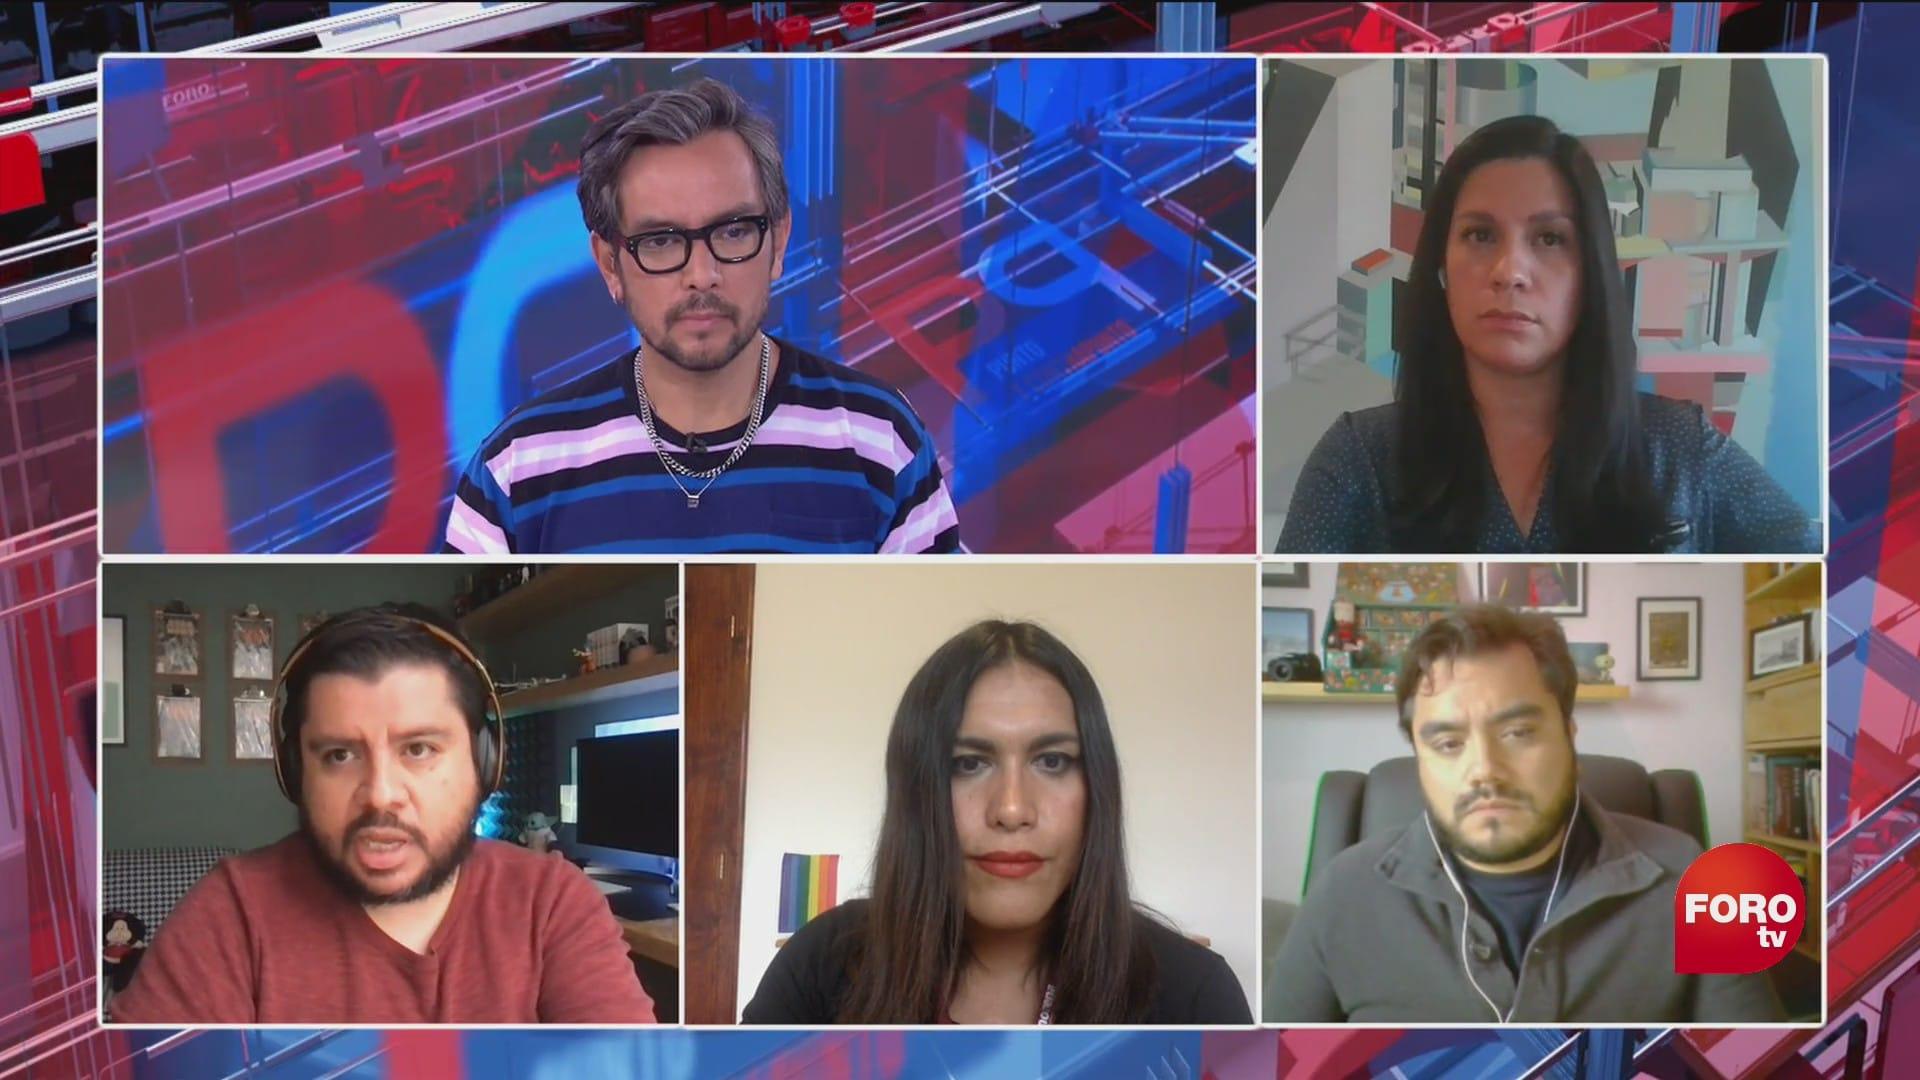 kamala harris en mexico de nuevo enfrenta criticas